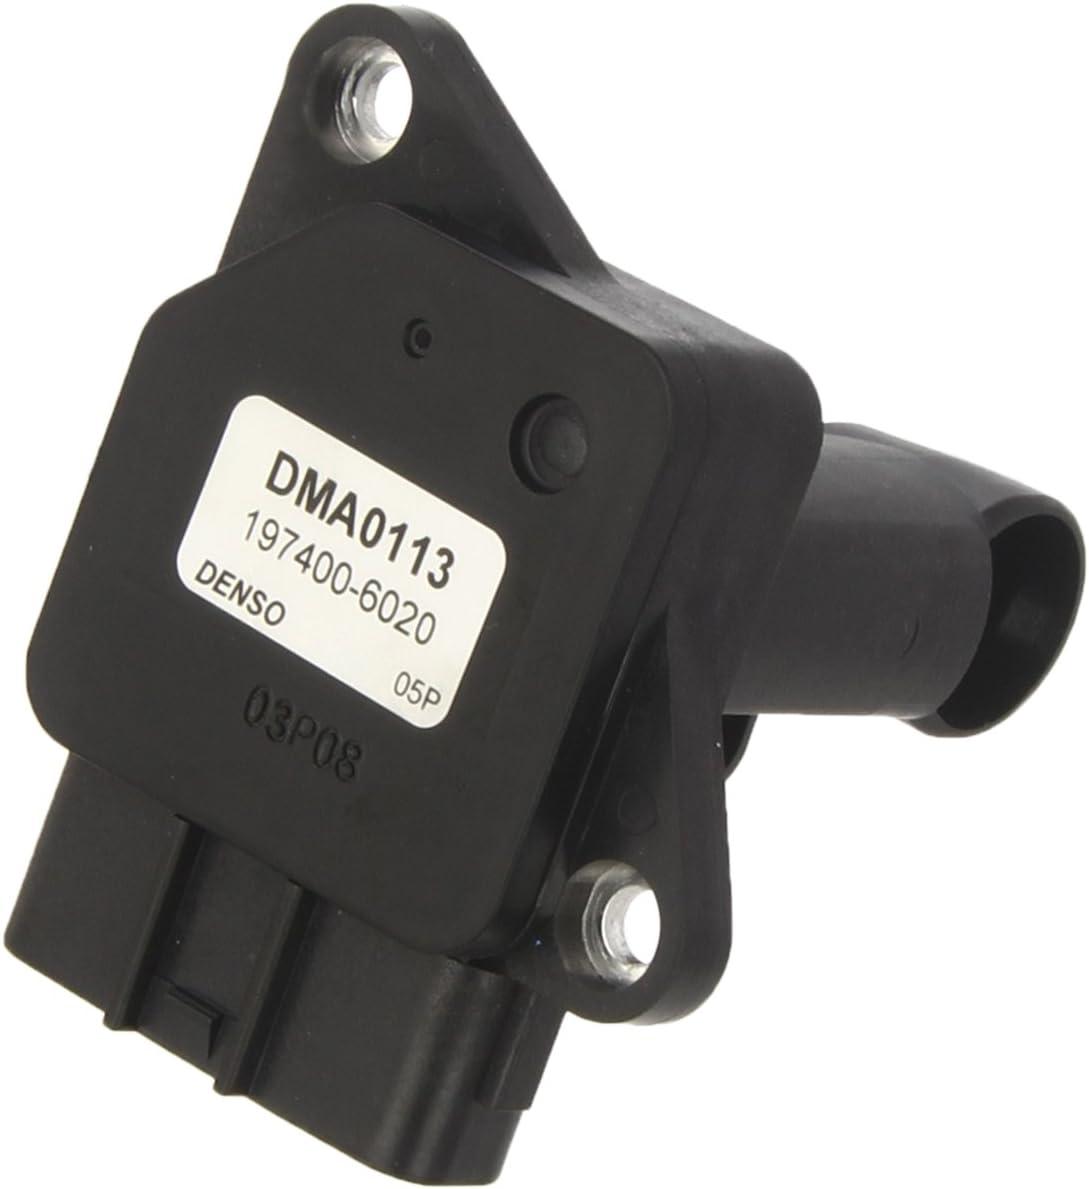 Denso Dma 0113 Luftmassenmesser Auto